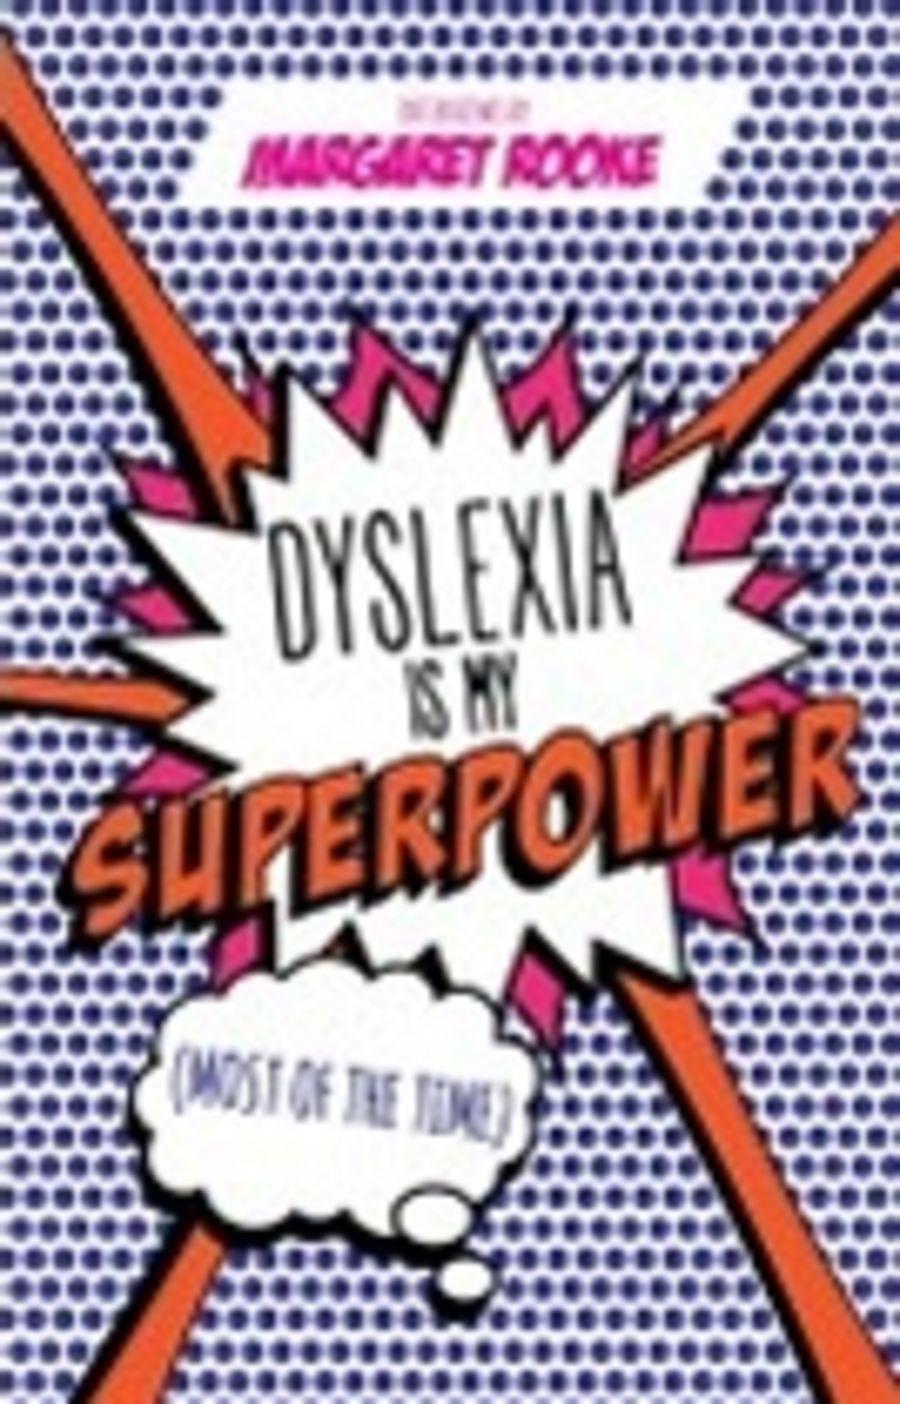 Dyslexia is my Superpower